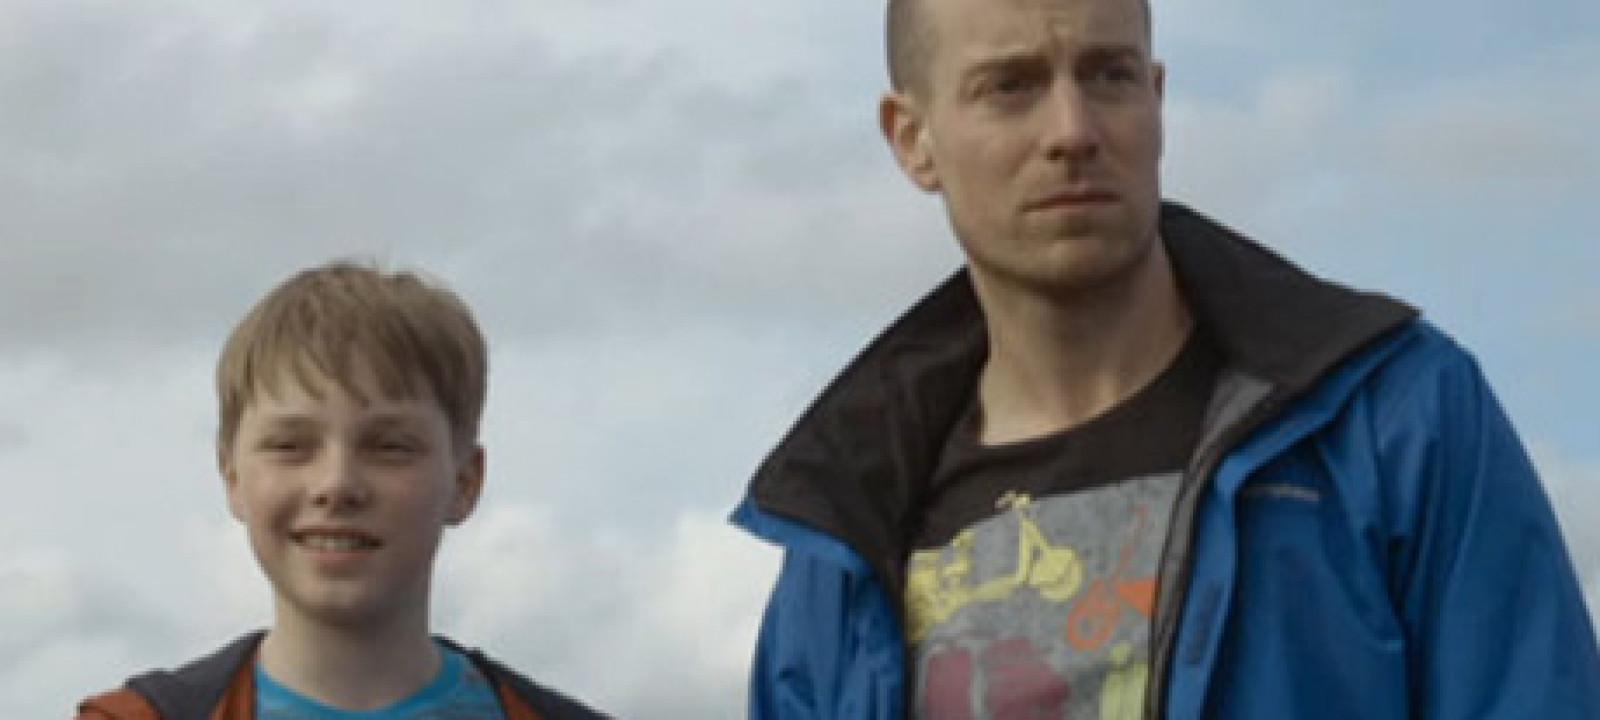 Broadchurch\' Recap: Episode 8, Season Finale | Anglophenia | BBC America